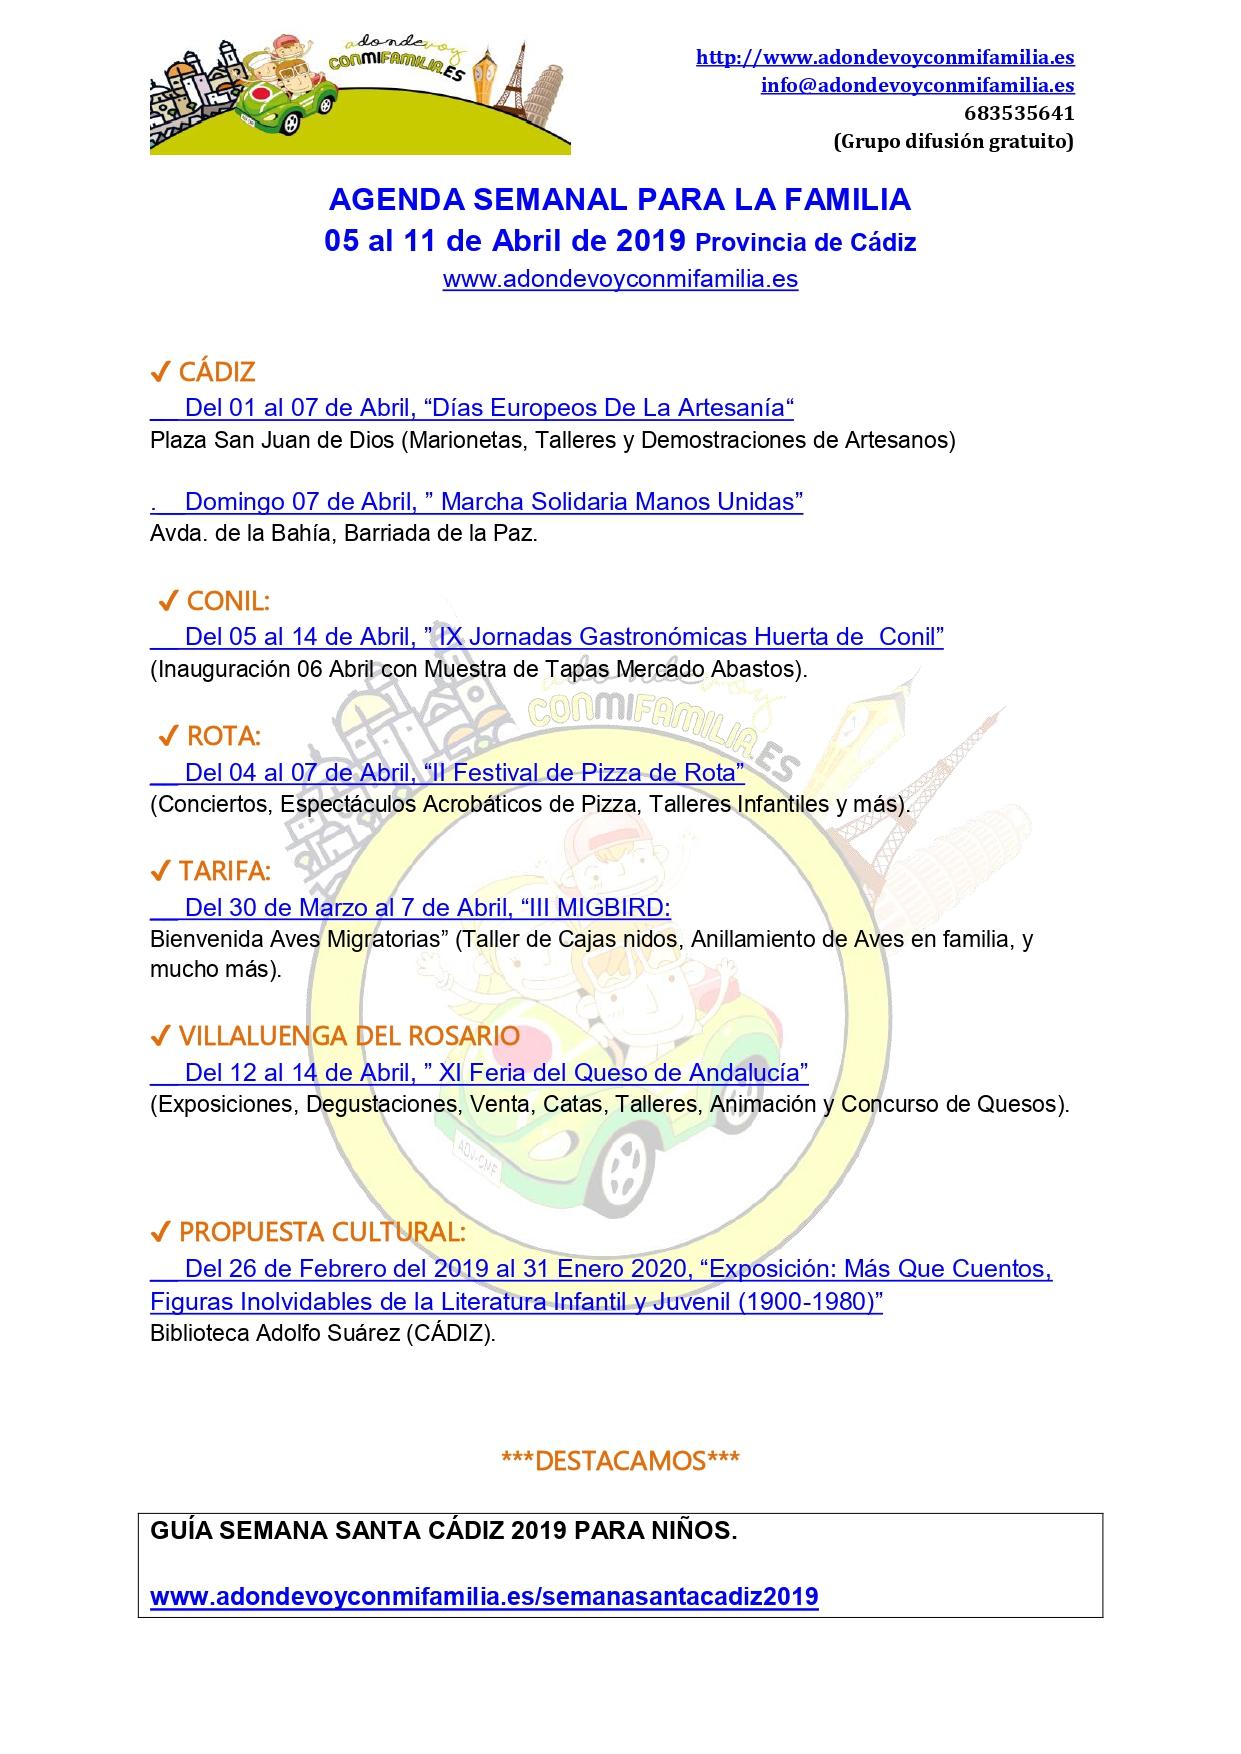 Agenda semanal familiar 5 al 11 abril 2019 Provincia de Cadiz Adondevoyconmifamilia